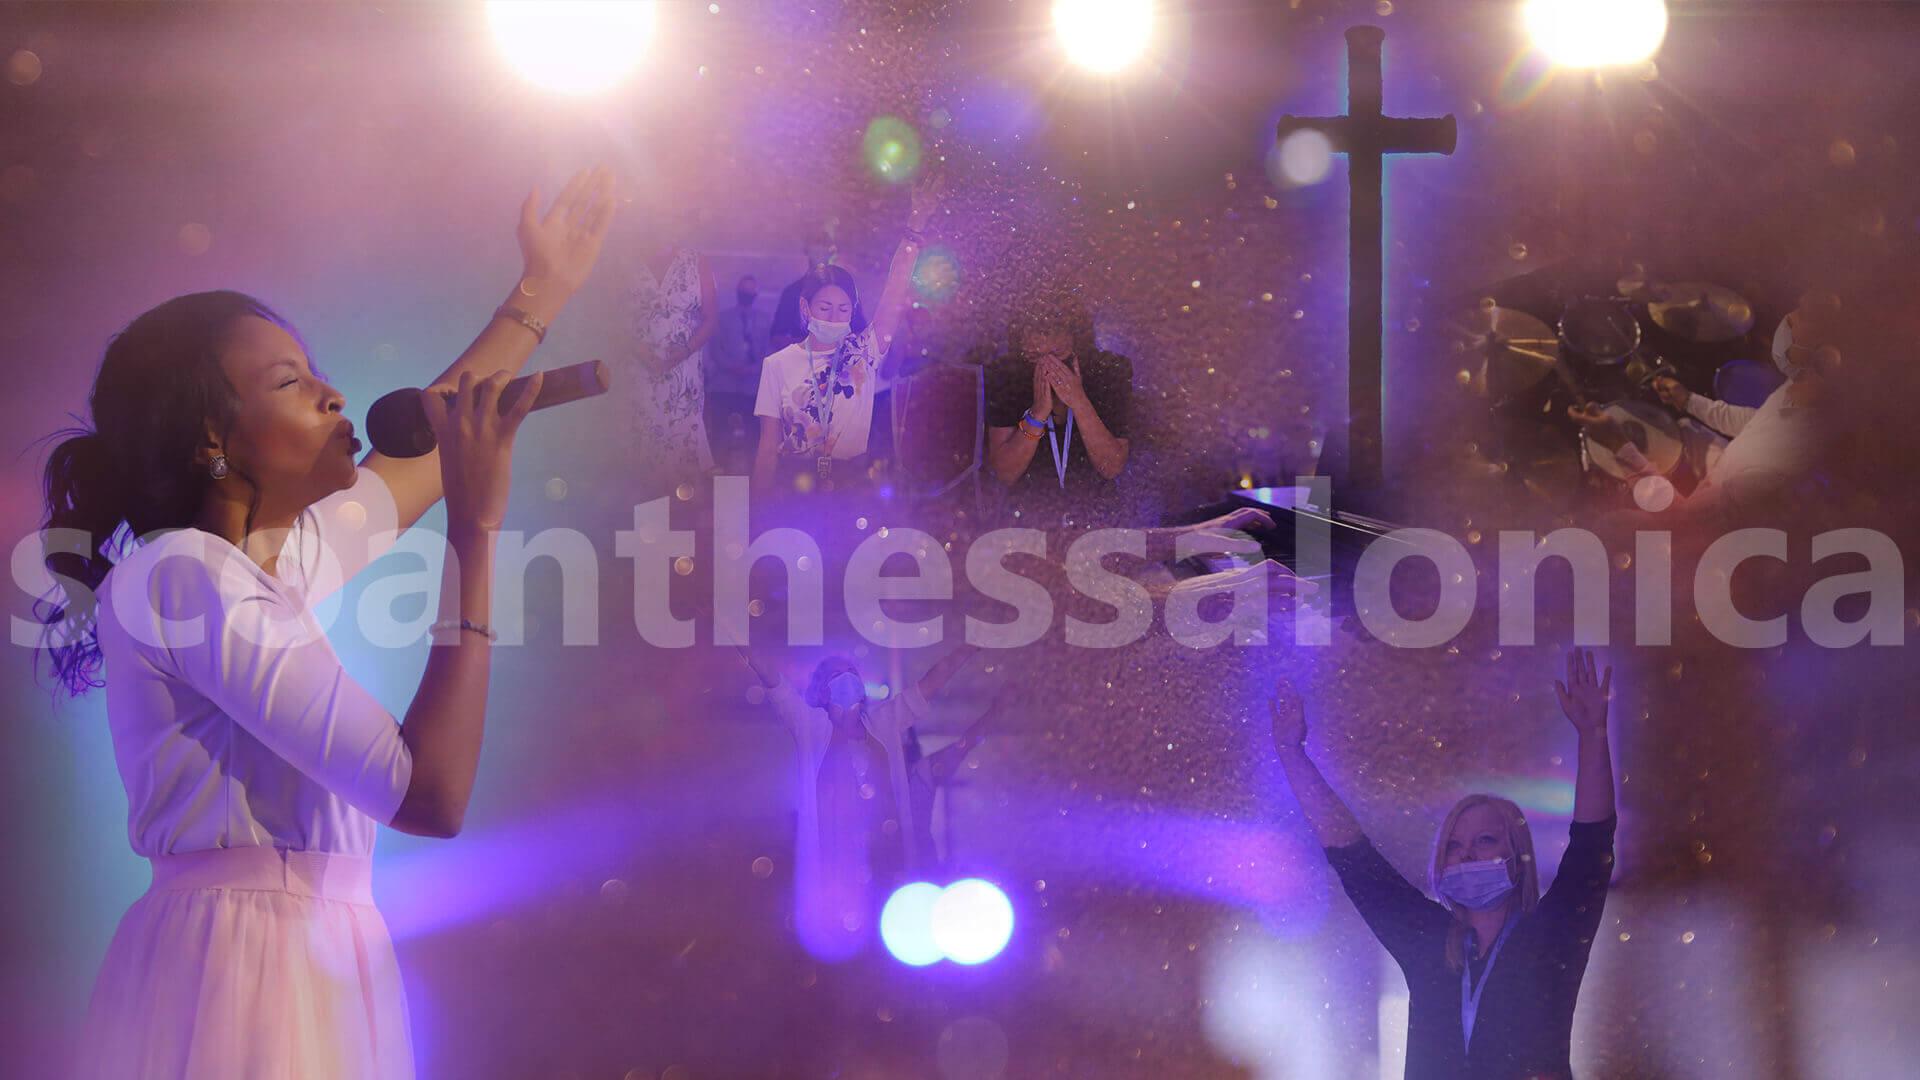 SCOAN_THESSALONICA_WORSHIP_2020_09_13